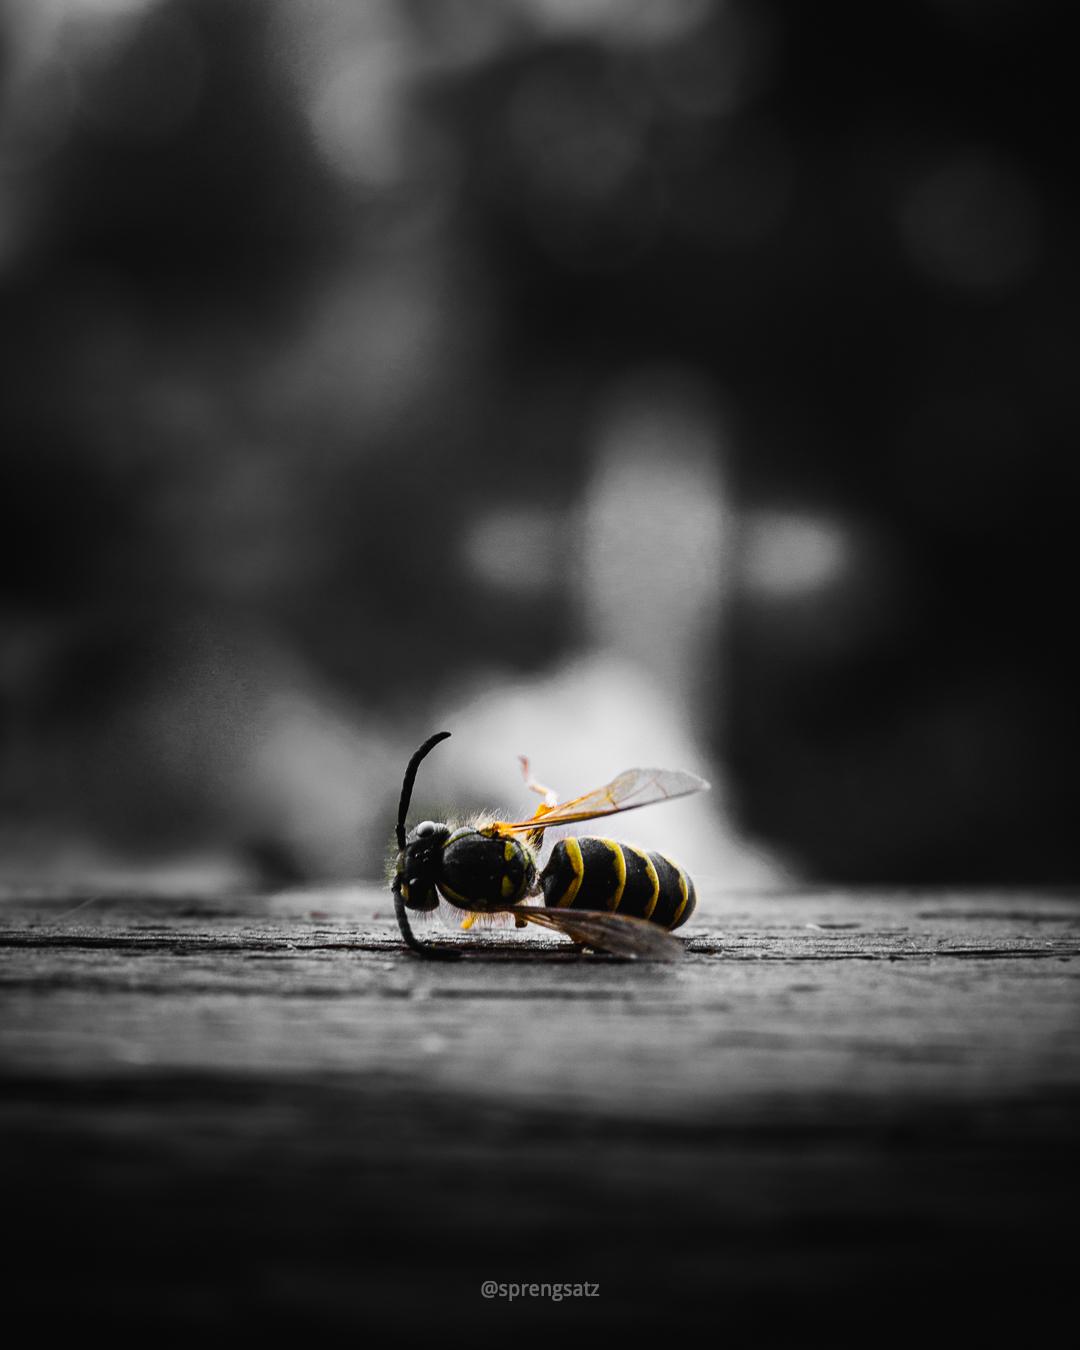 Macroaufnahme einer toten Wespe